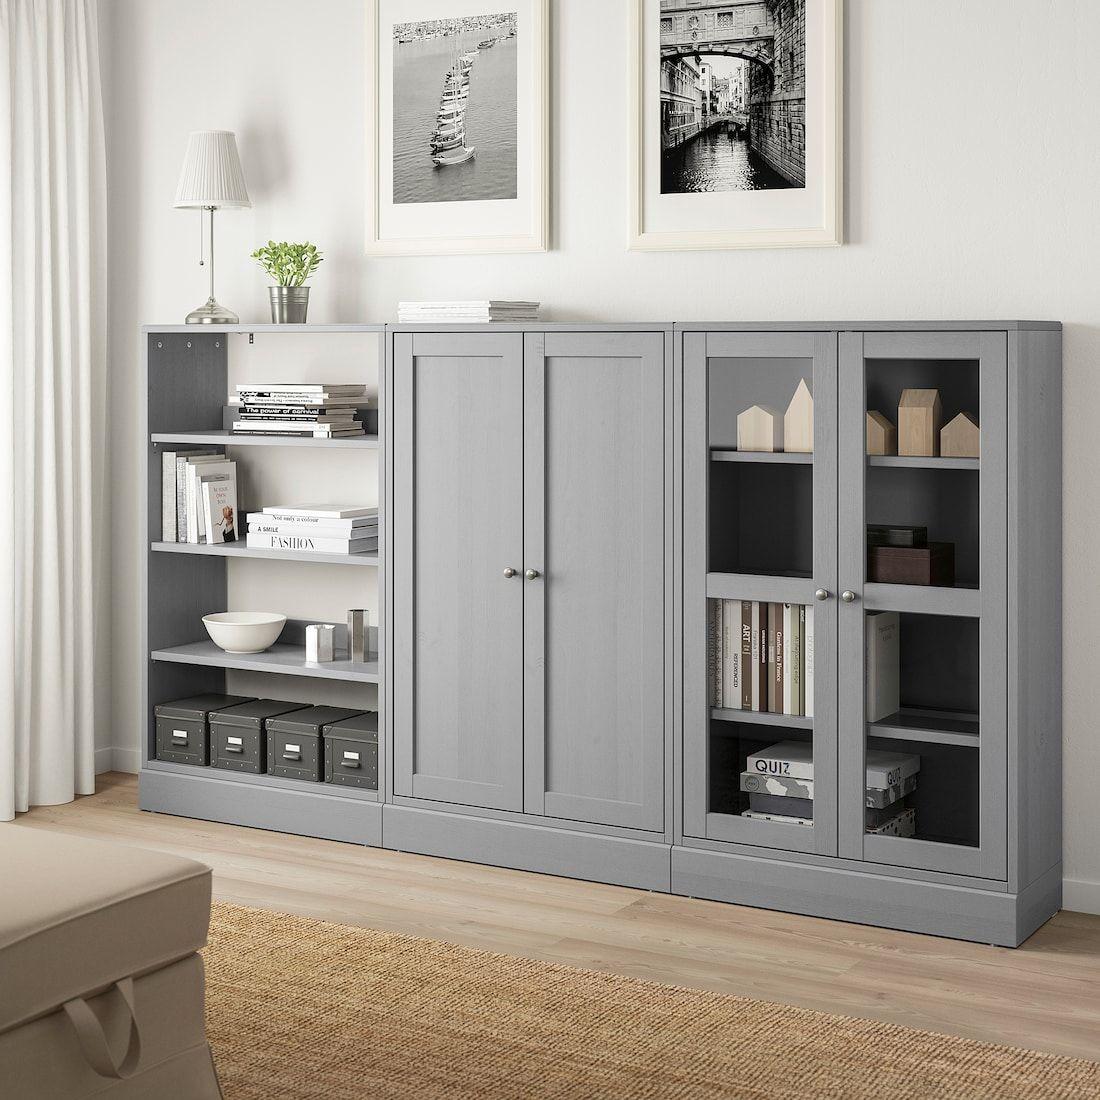 Havsta Storage Combination W Glass Doors Gray 95 5 8x14 5 8x52 3 4 Ikea In 2020 Living Room Storage Cabinet Ikea Dining Room Dining Room Storage